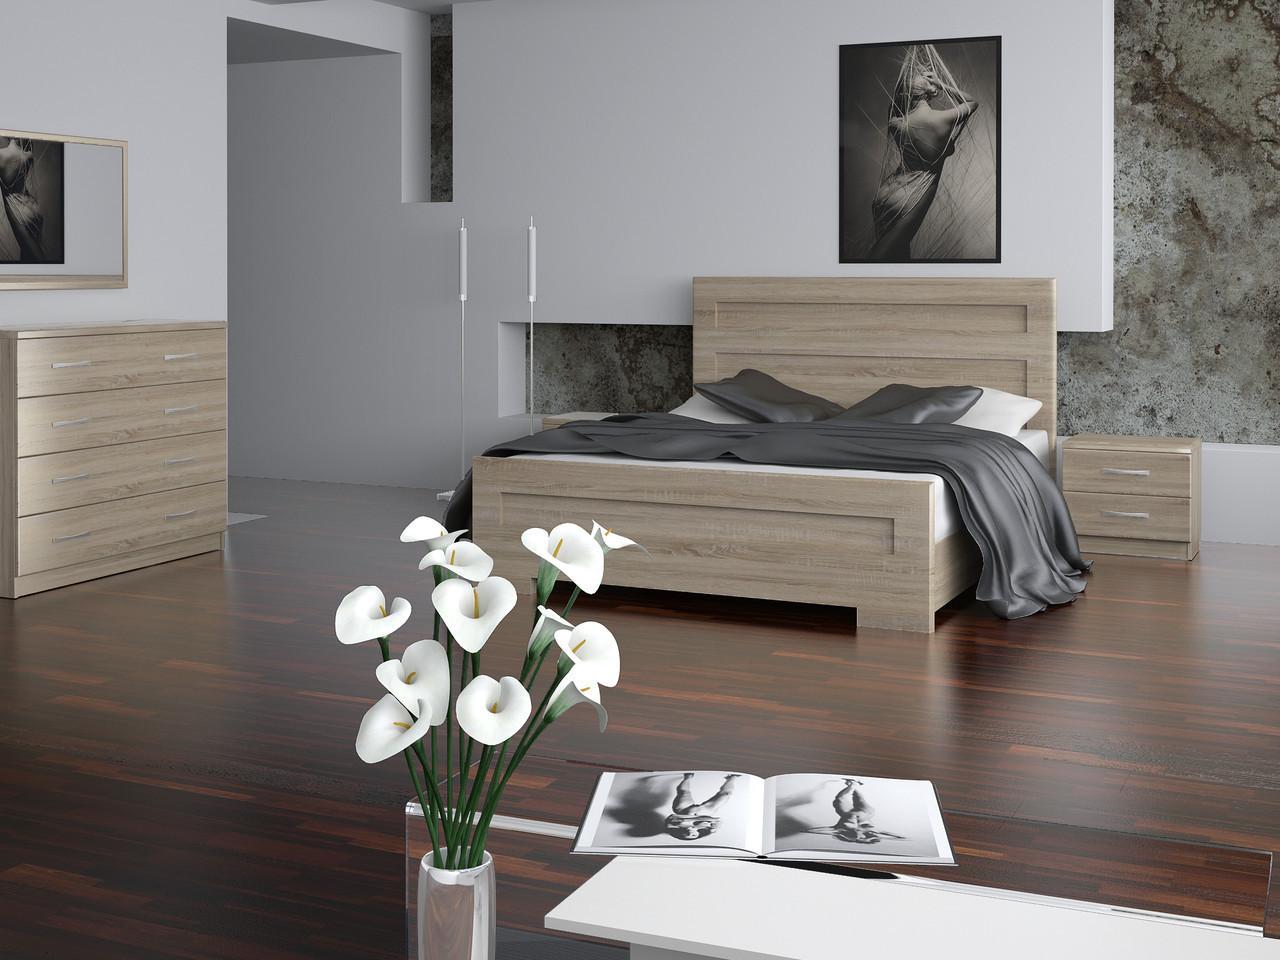 Кровать Кармен 1,8 м дуб сонома